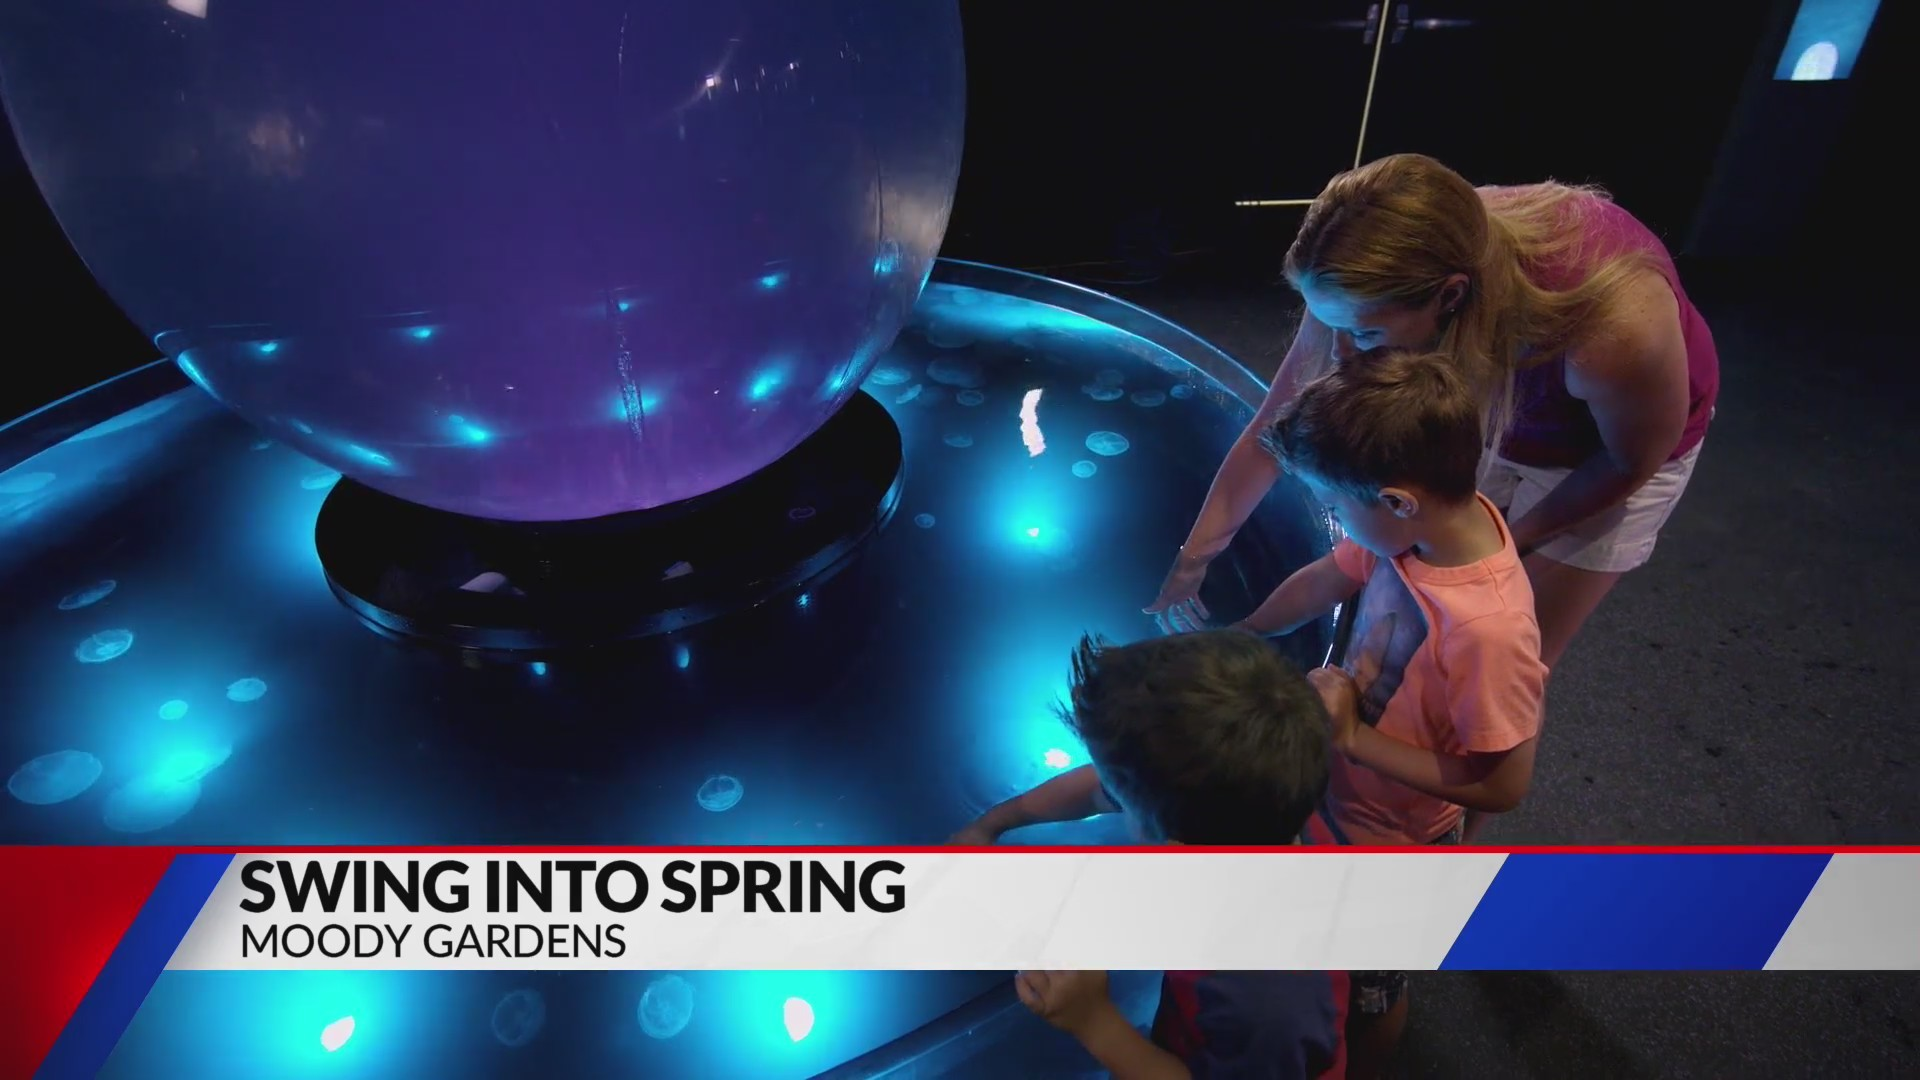 Swing_into_Spring___Moody_Gardens_0_20190304143118